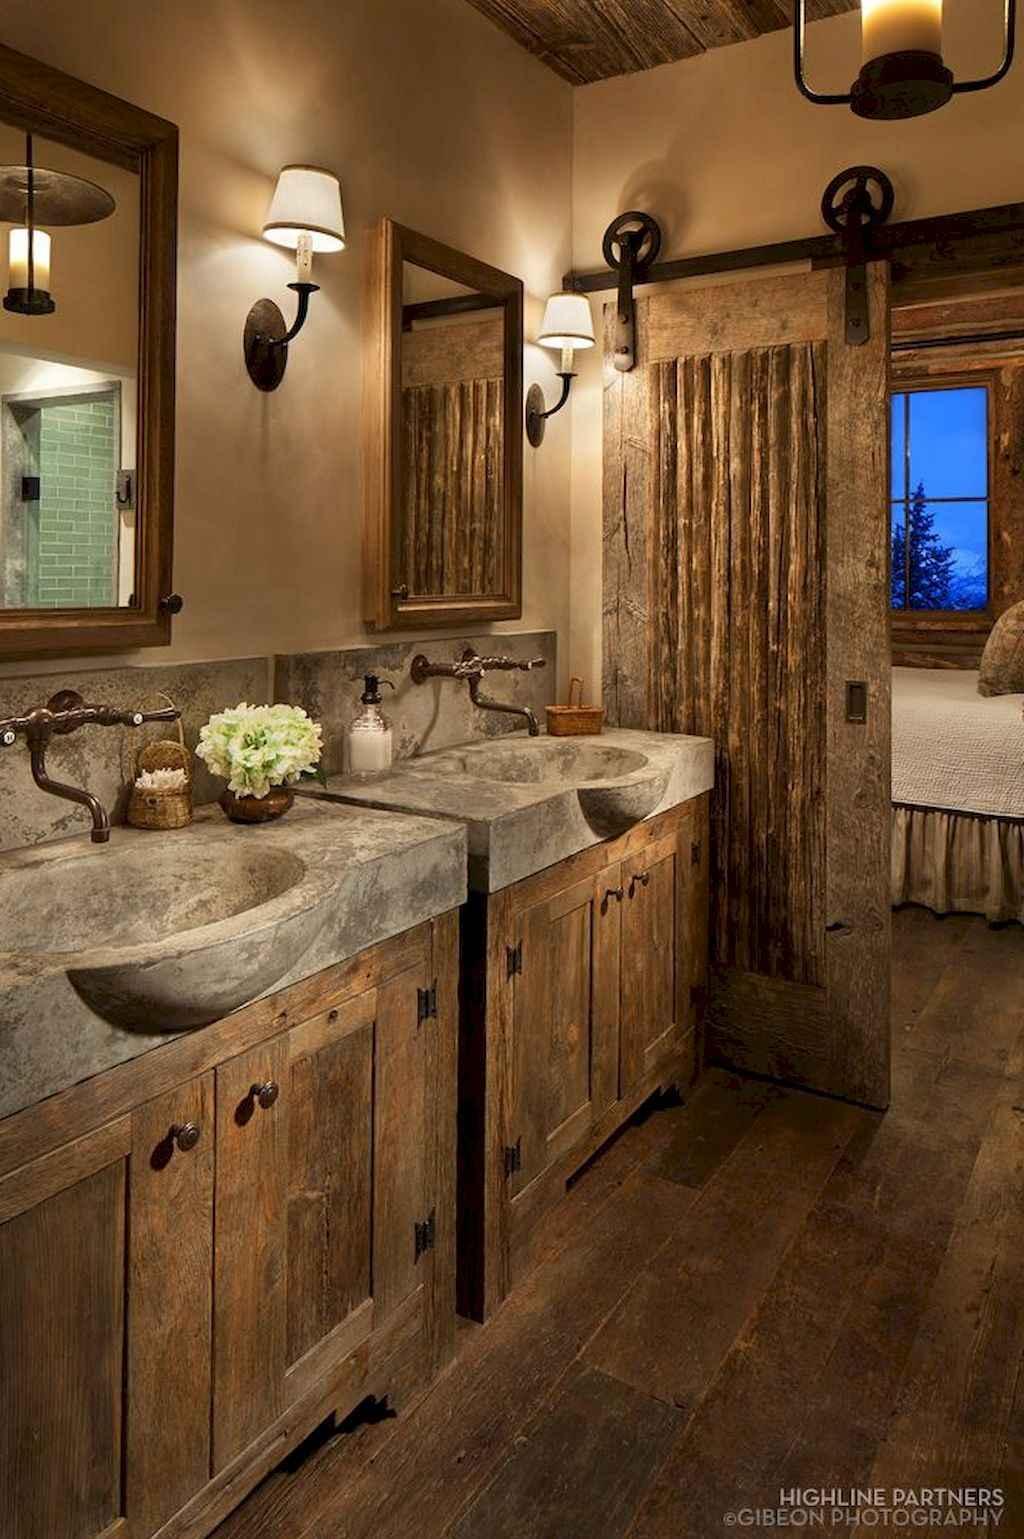 Inspiring rustic bathroom decor ideas (7)